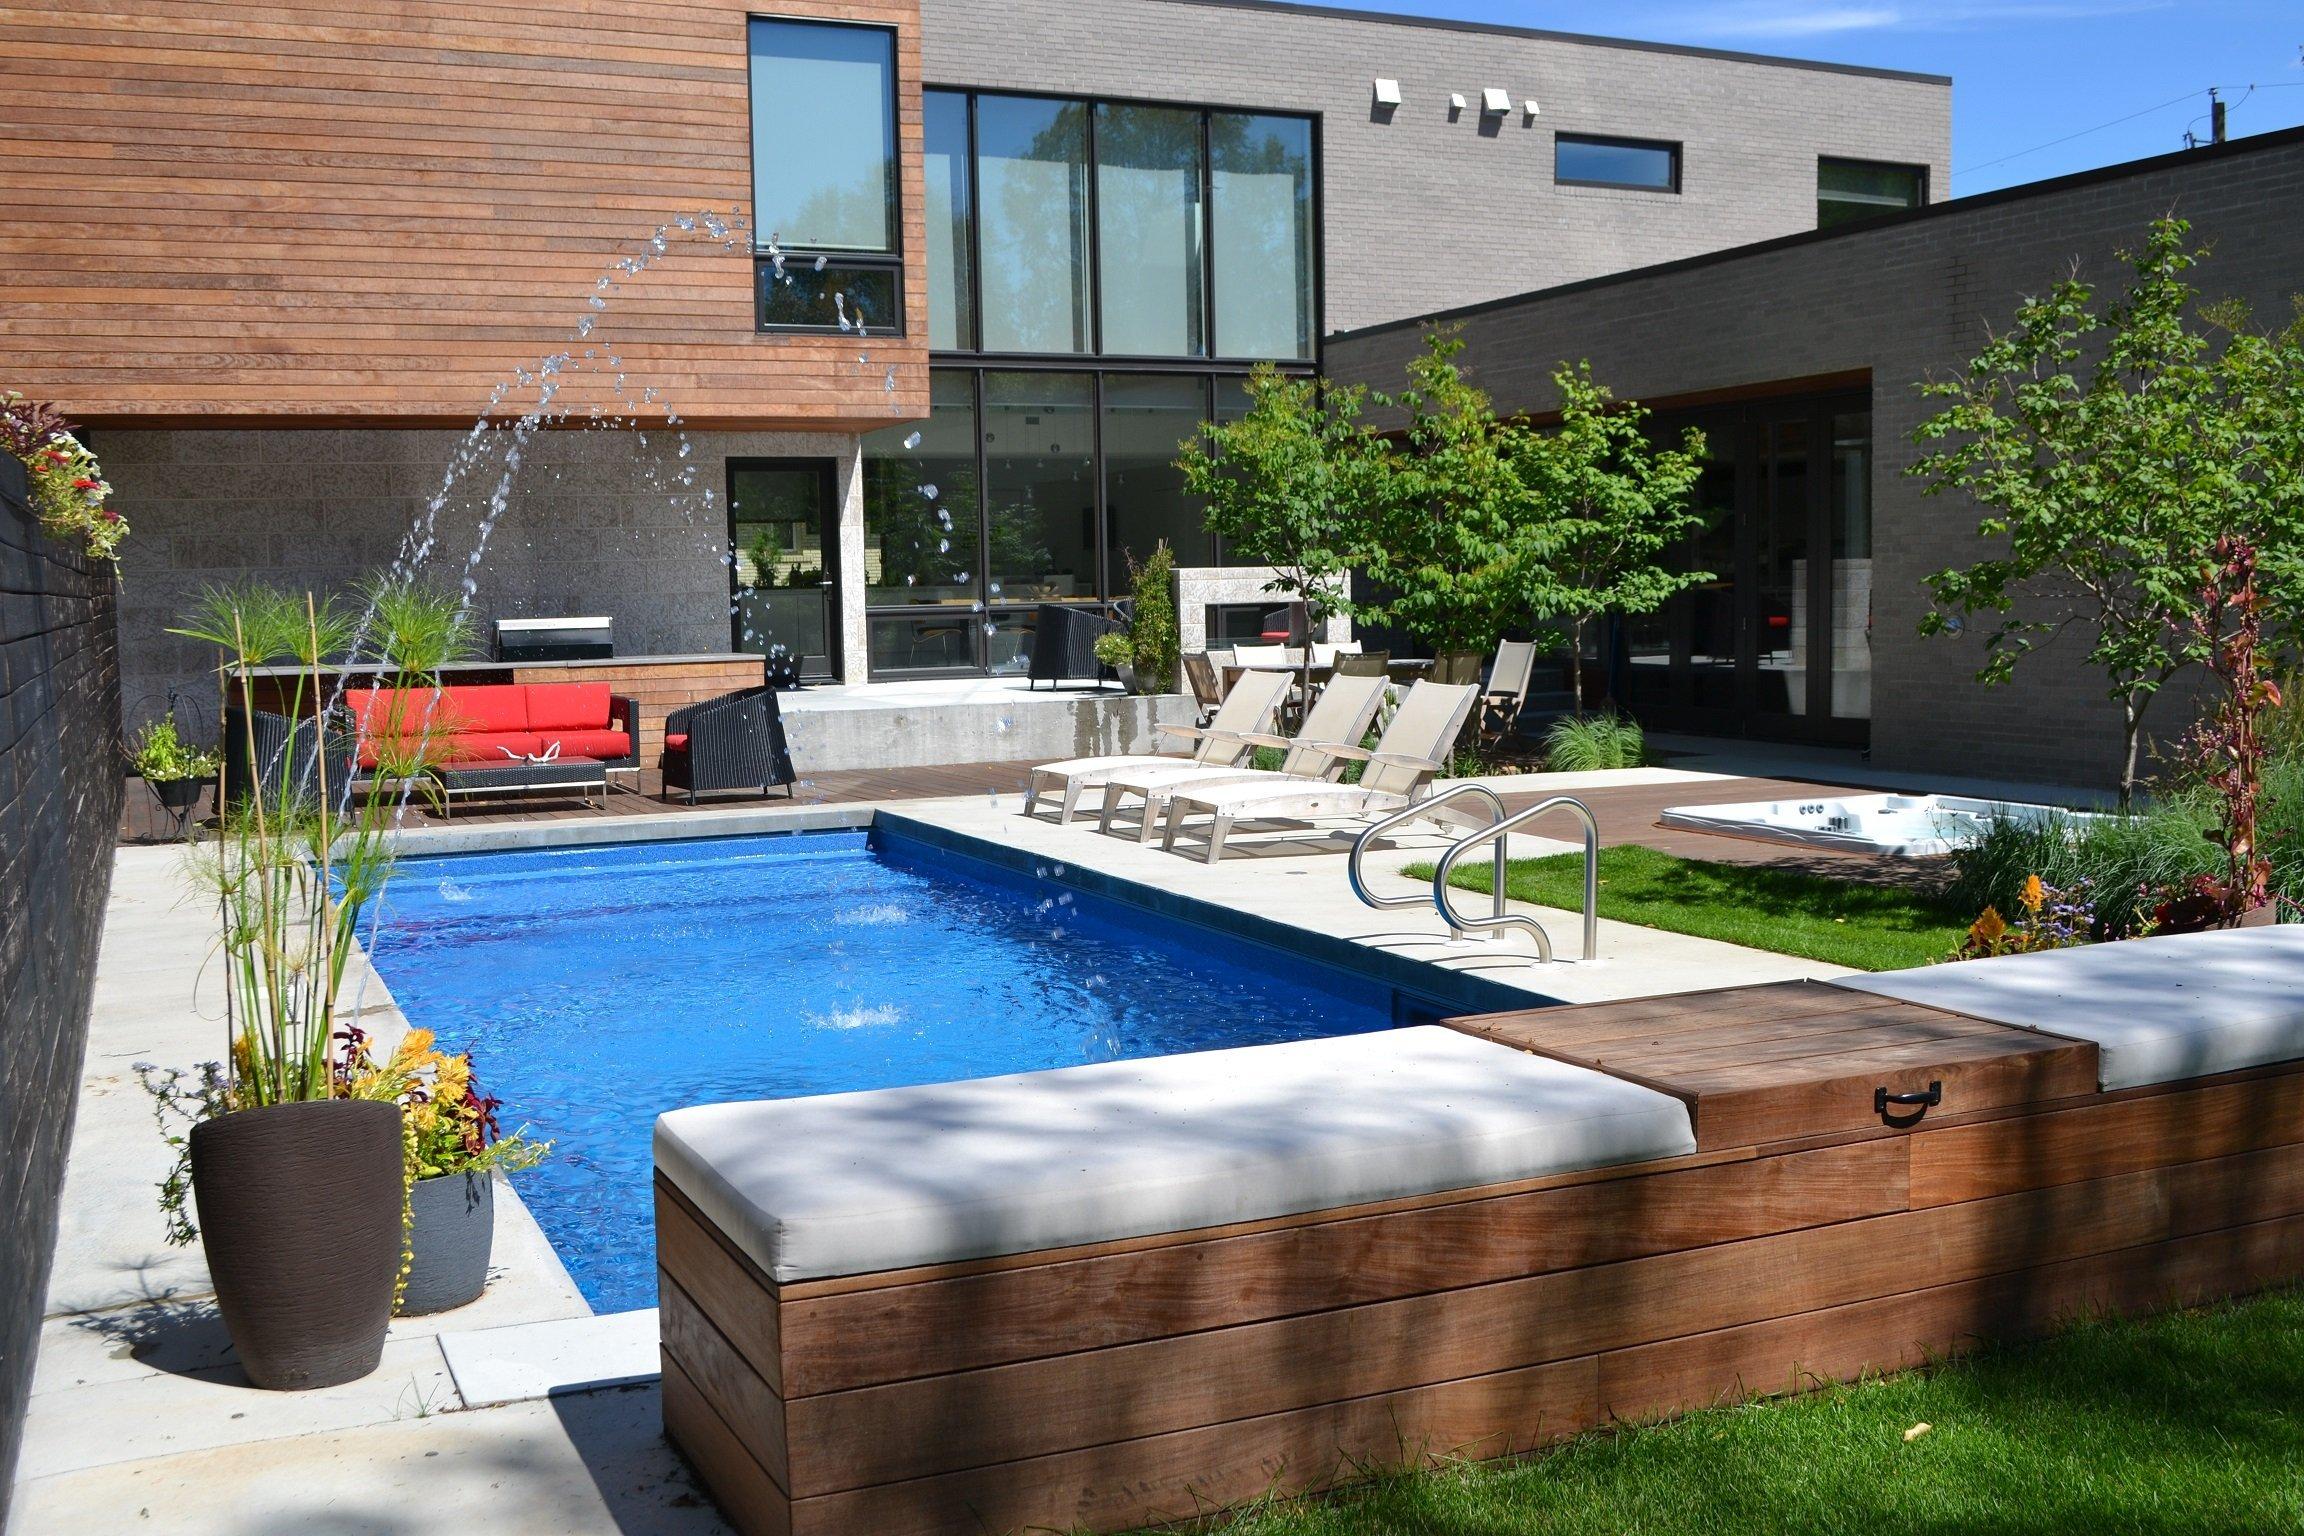 Pools with waterfalls hidden features aqua tech for Pool design regrets